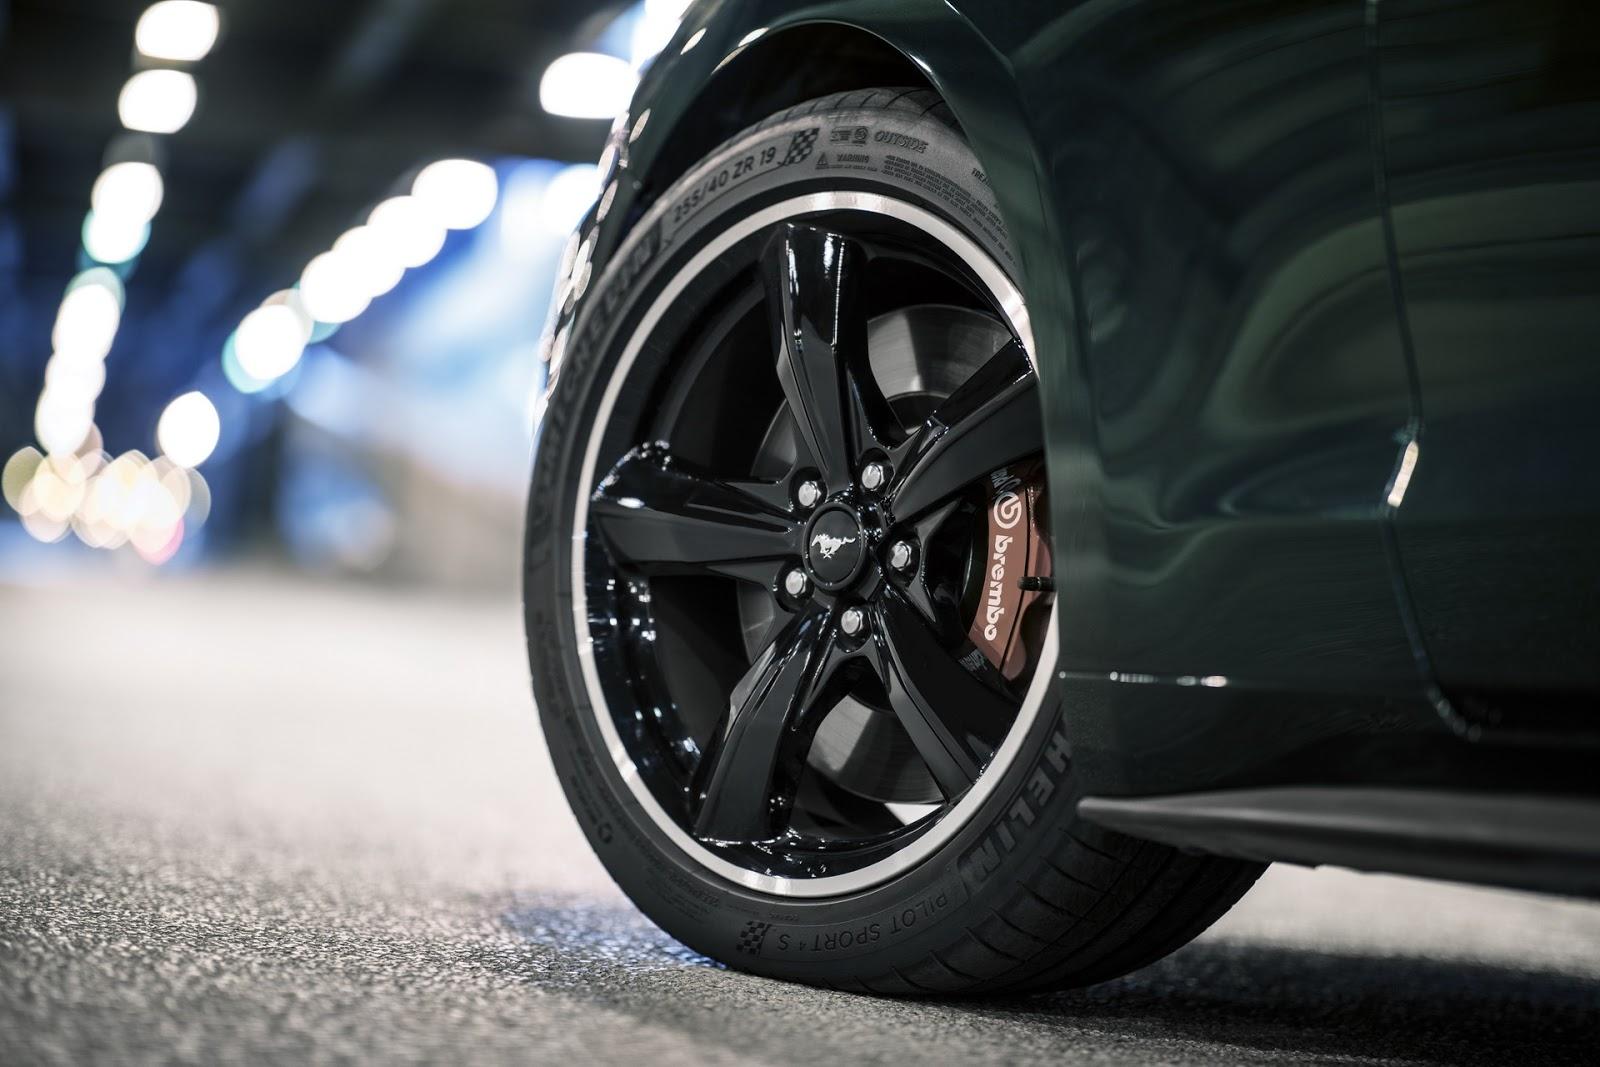 Ford omaggia Steve McQueen: ecco la Mustang Bullitt 2018